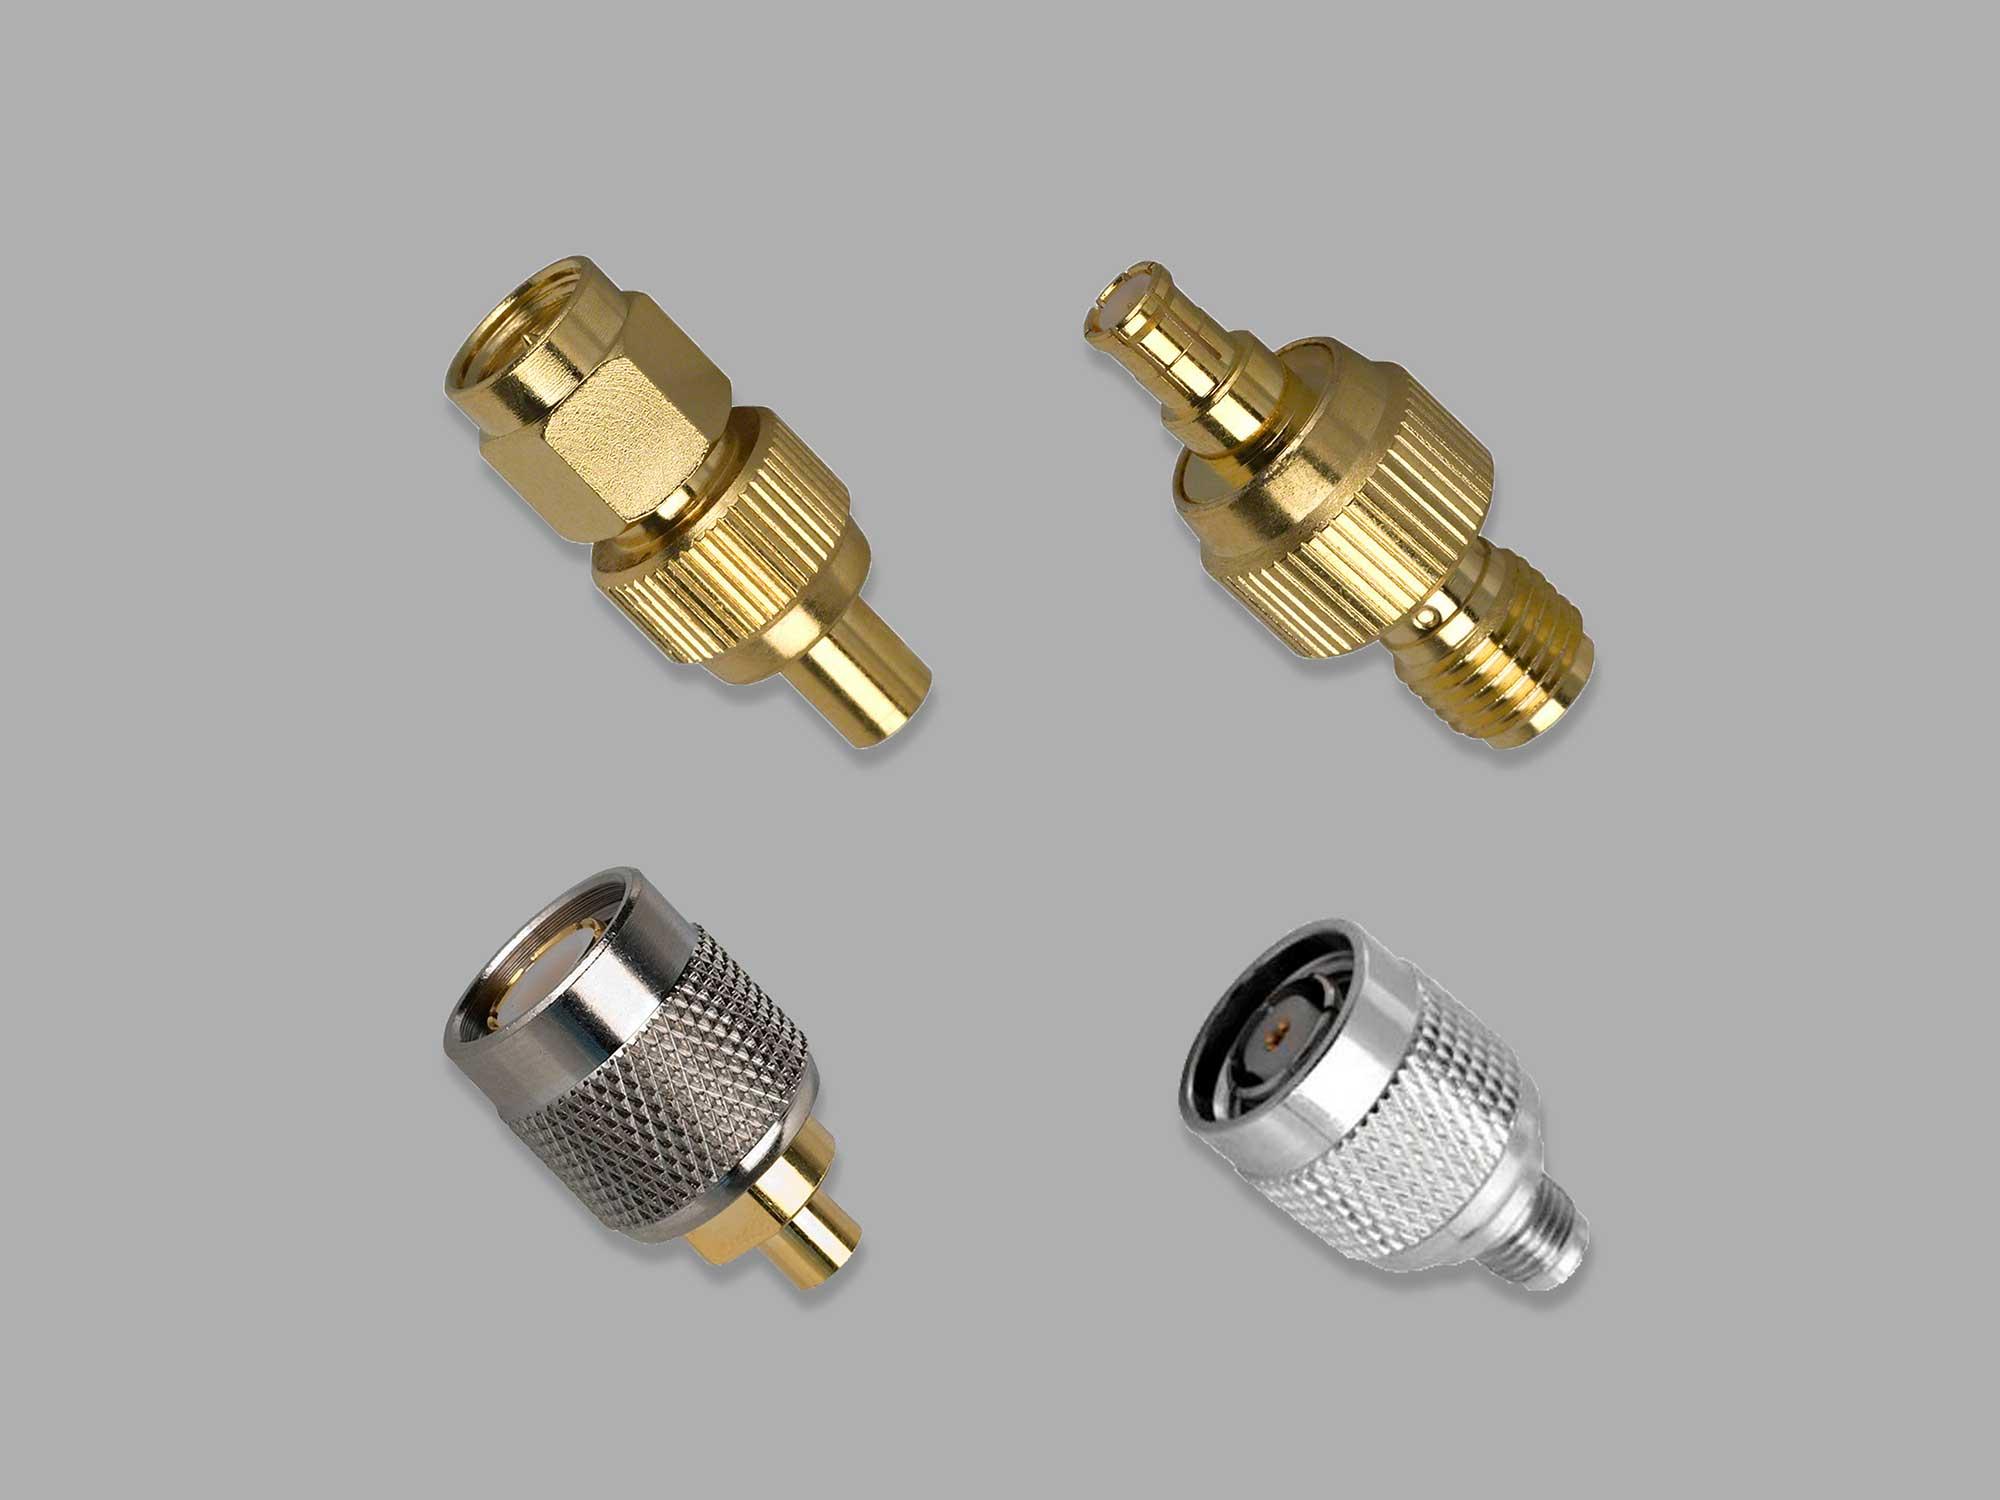 RF adapters